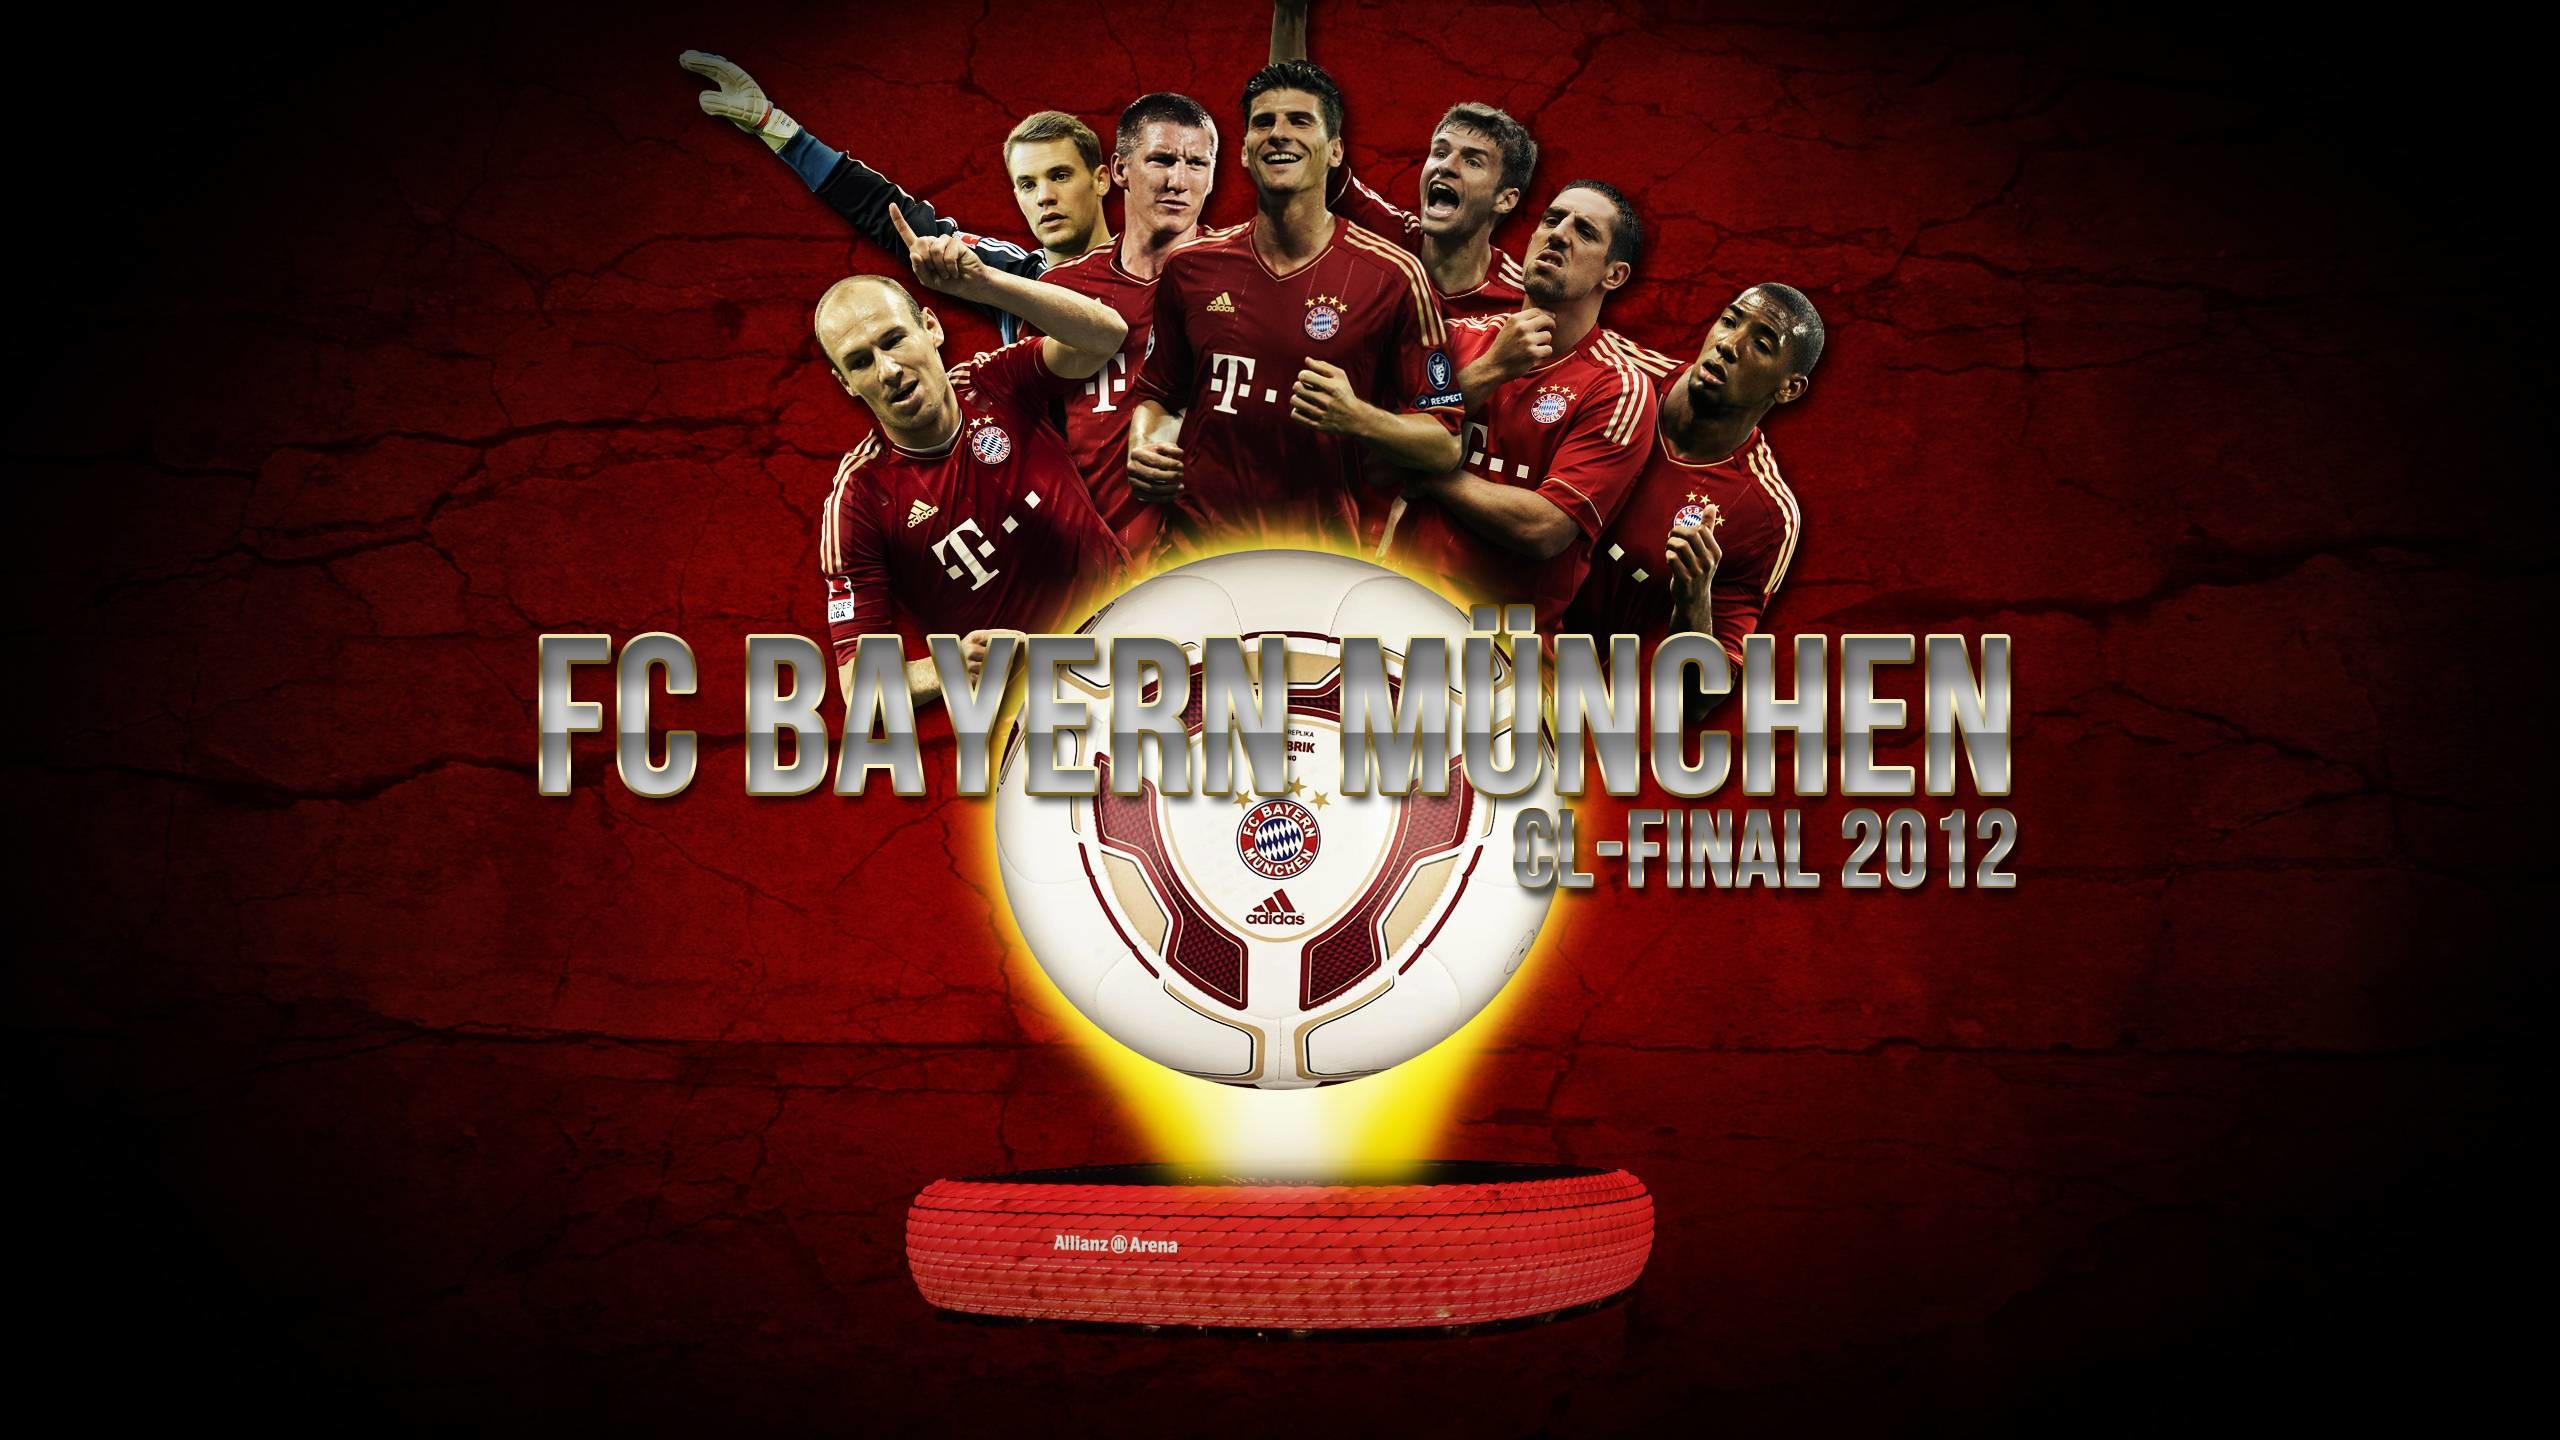 DeviantArt: More Like FC Bayern Munich Wallpaper JPG und PSD by Wybi